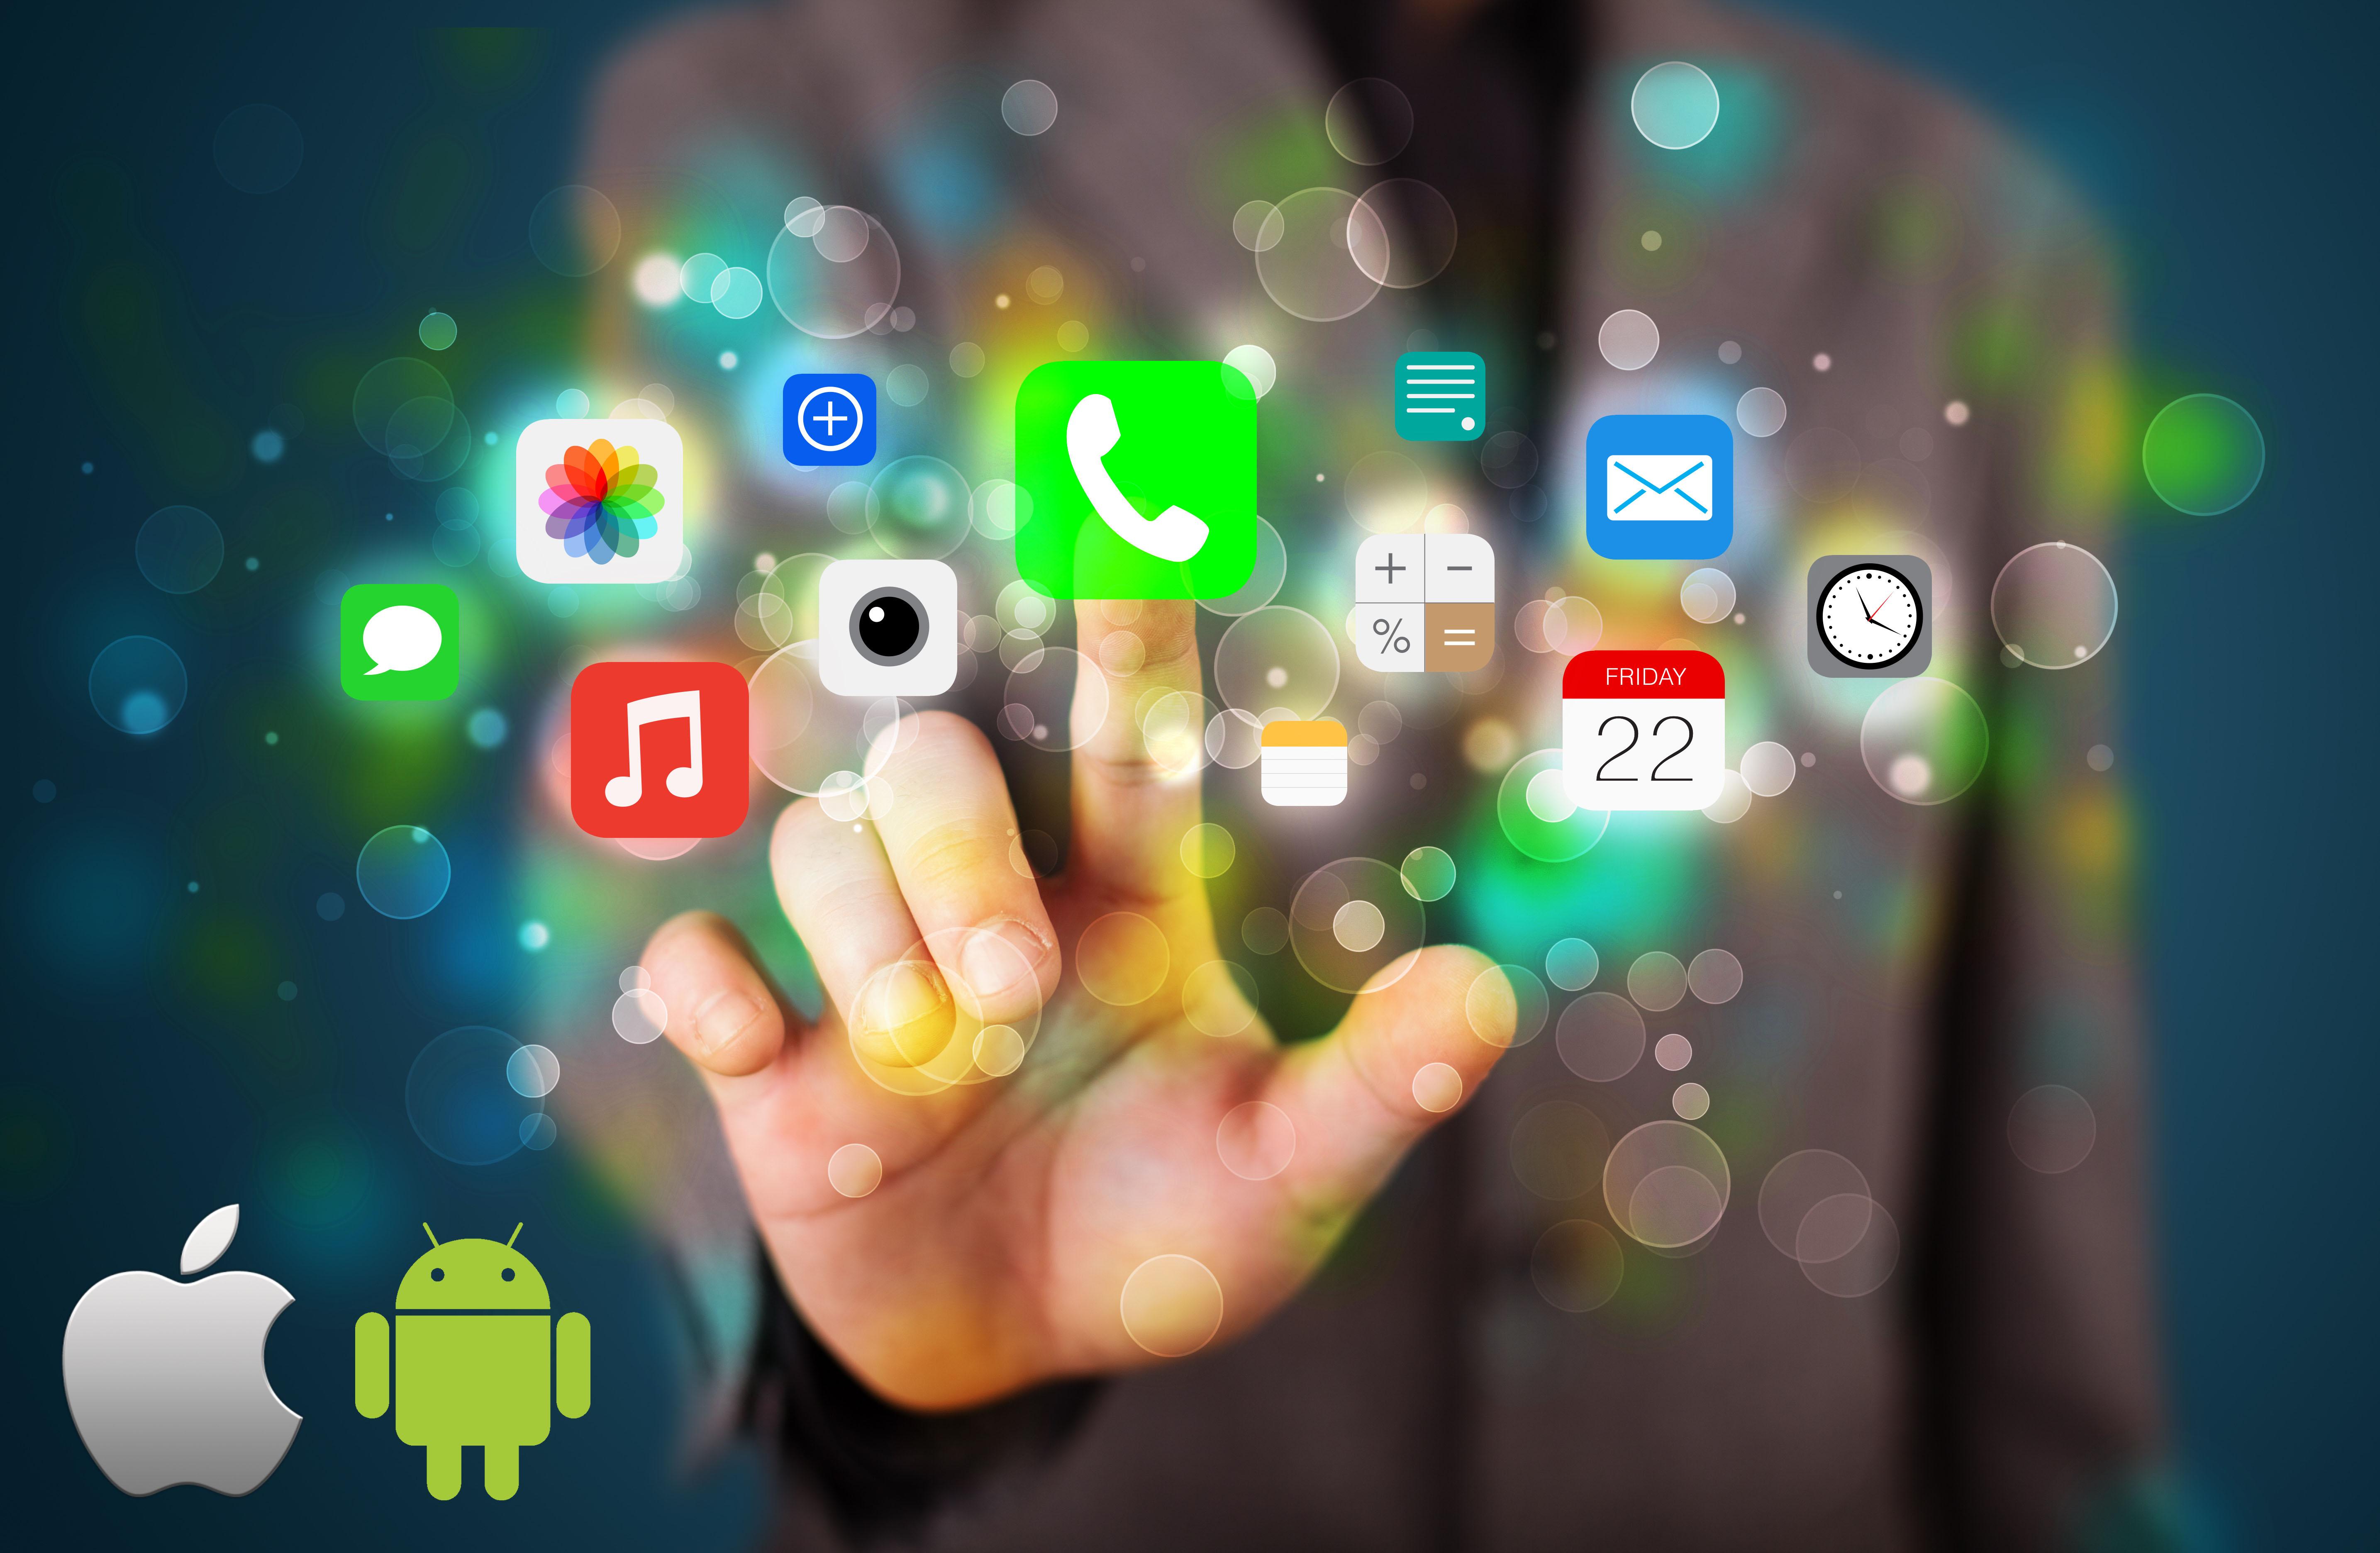 Les Applications mobiles, bataille entre Android et IOS